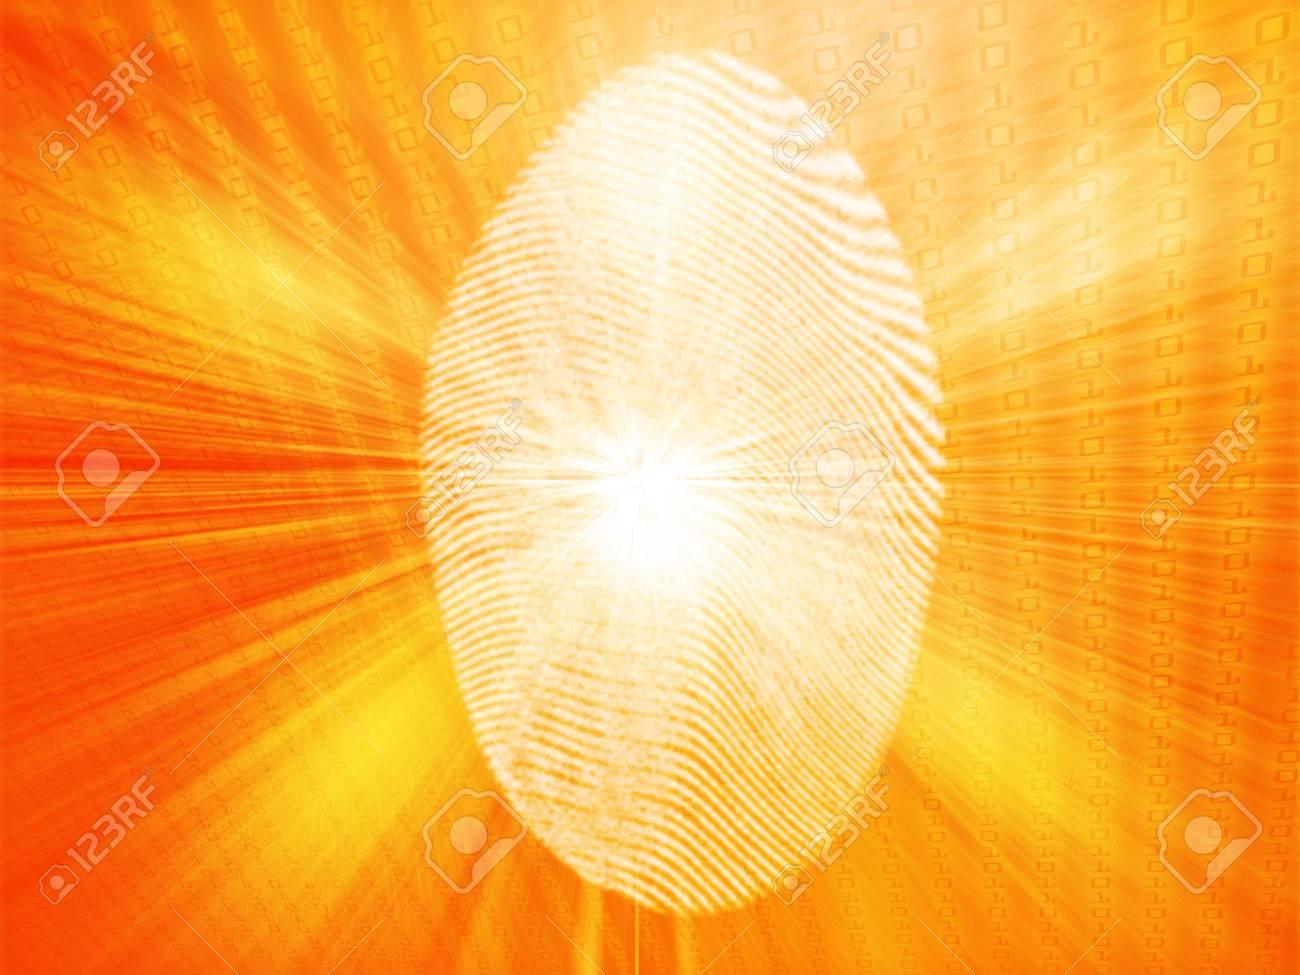 Digital fingerprint biometric security indentifaction, graphic illustration Stock Photo - 4558709